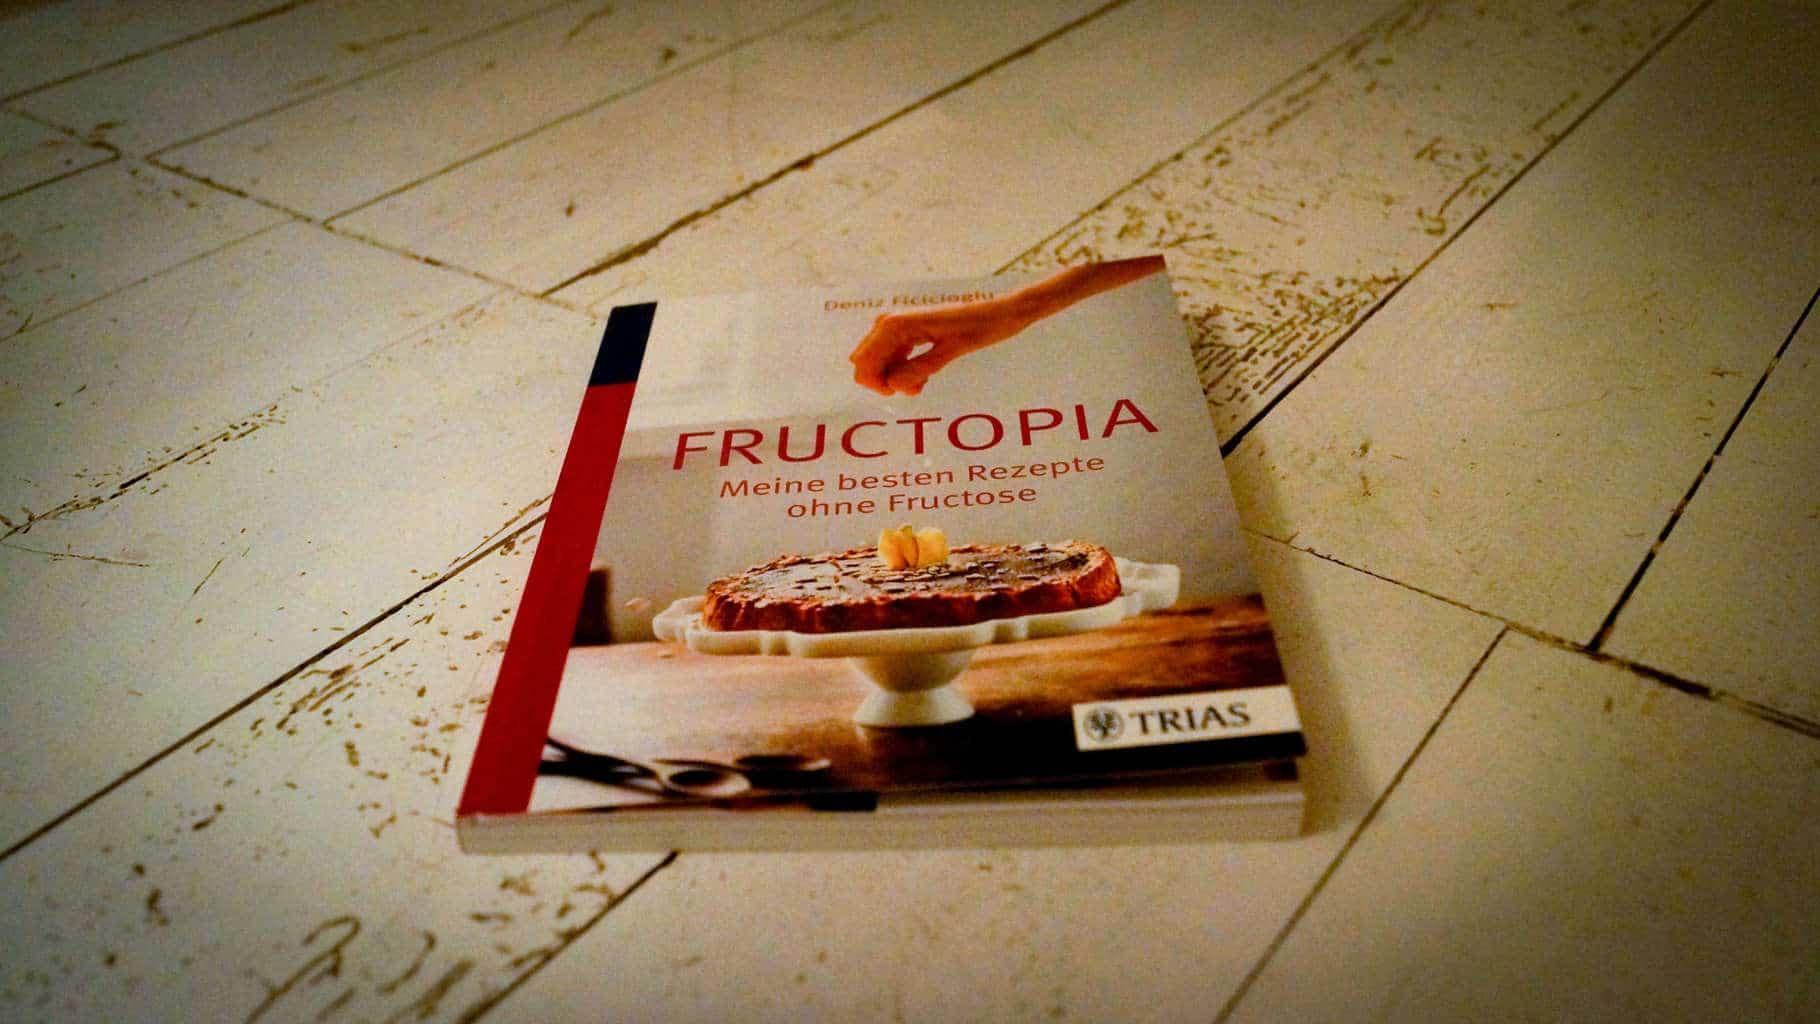 FRUCTOPIA – Meine besten Rezepte ohne Fructose